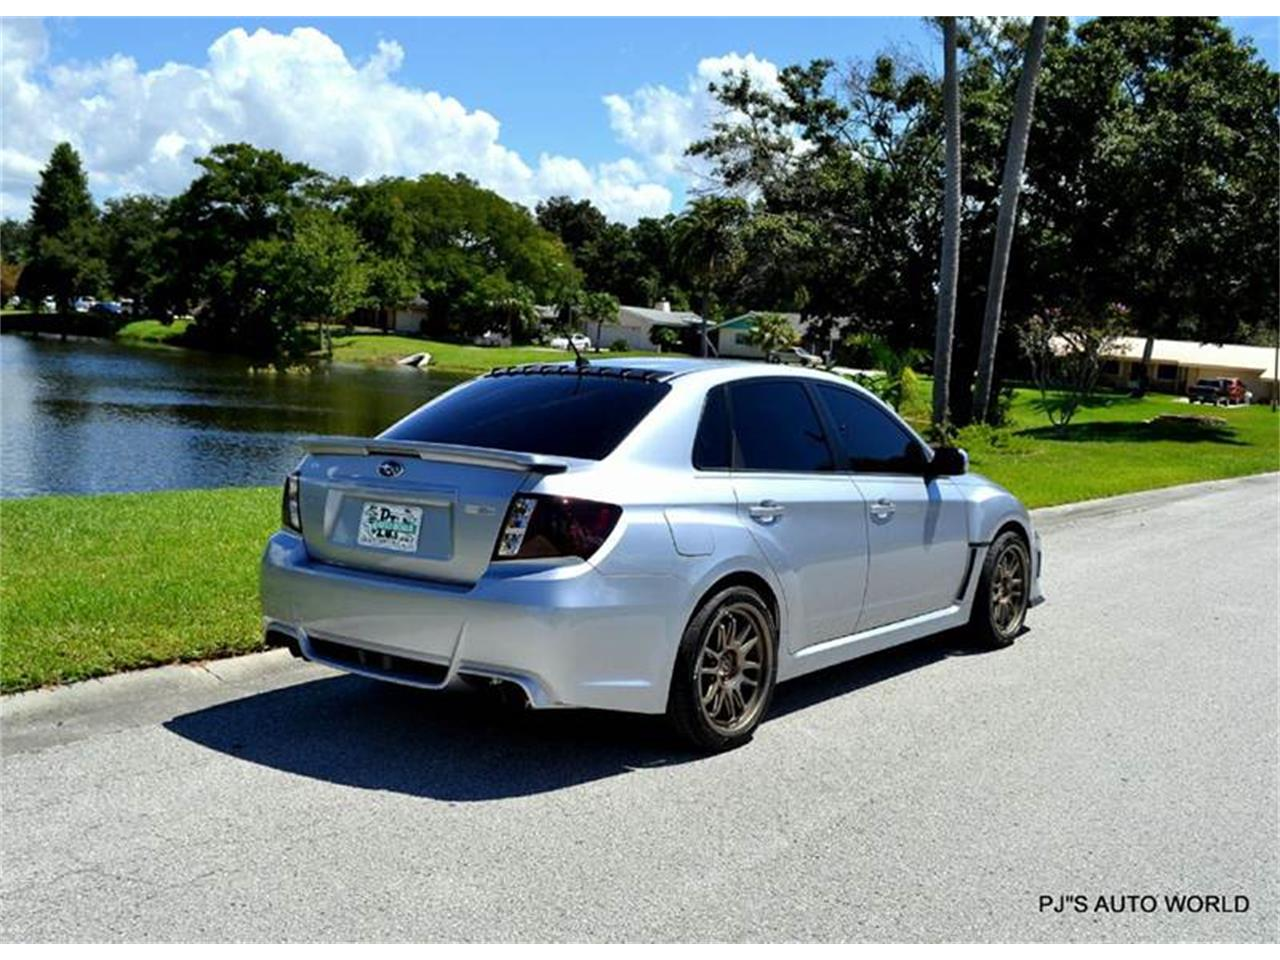 Large Picture of '13 Subaru Impreza Offered by PJ's Auto World - J6WM